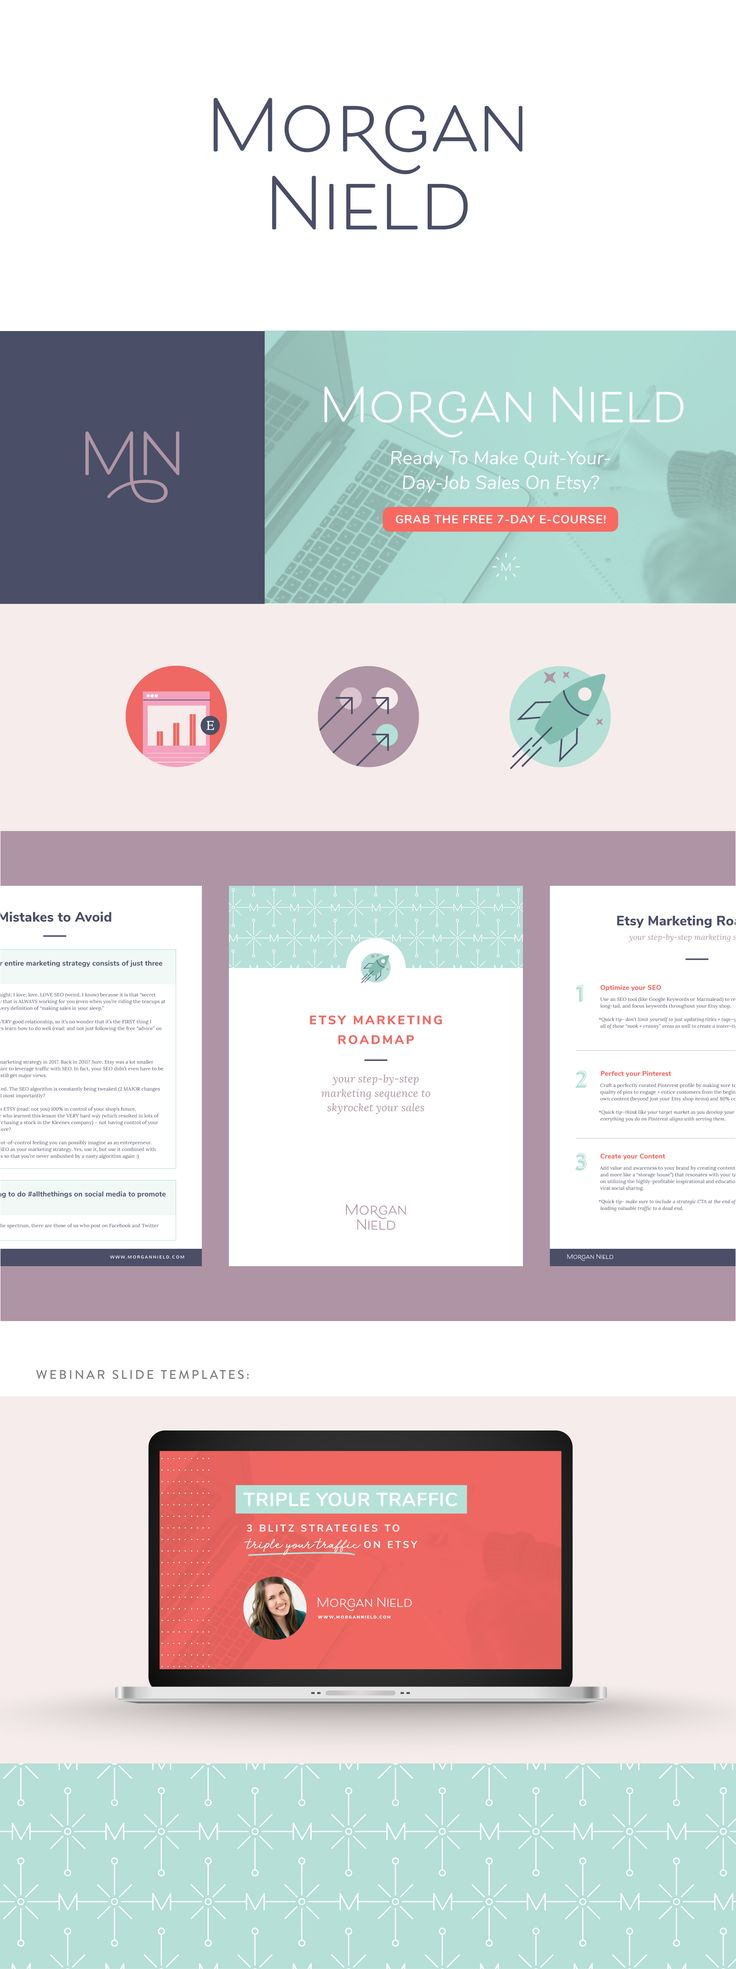 Morgan Nield brand identity | Spruce Rd. | logo design, pattern design, online marketing, e-course design, etsy, branding, icons, modern, worksheet design